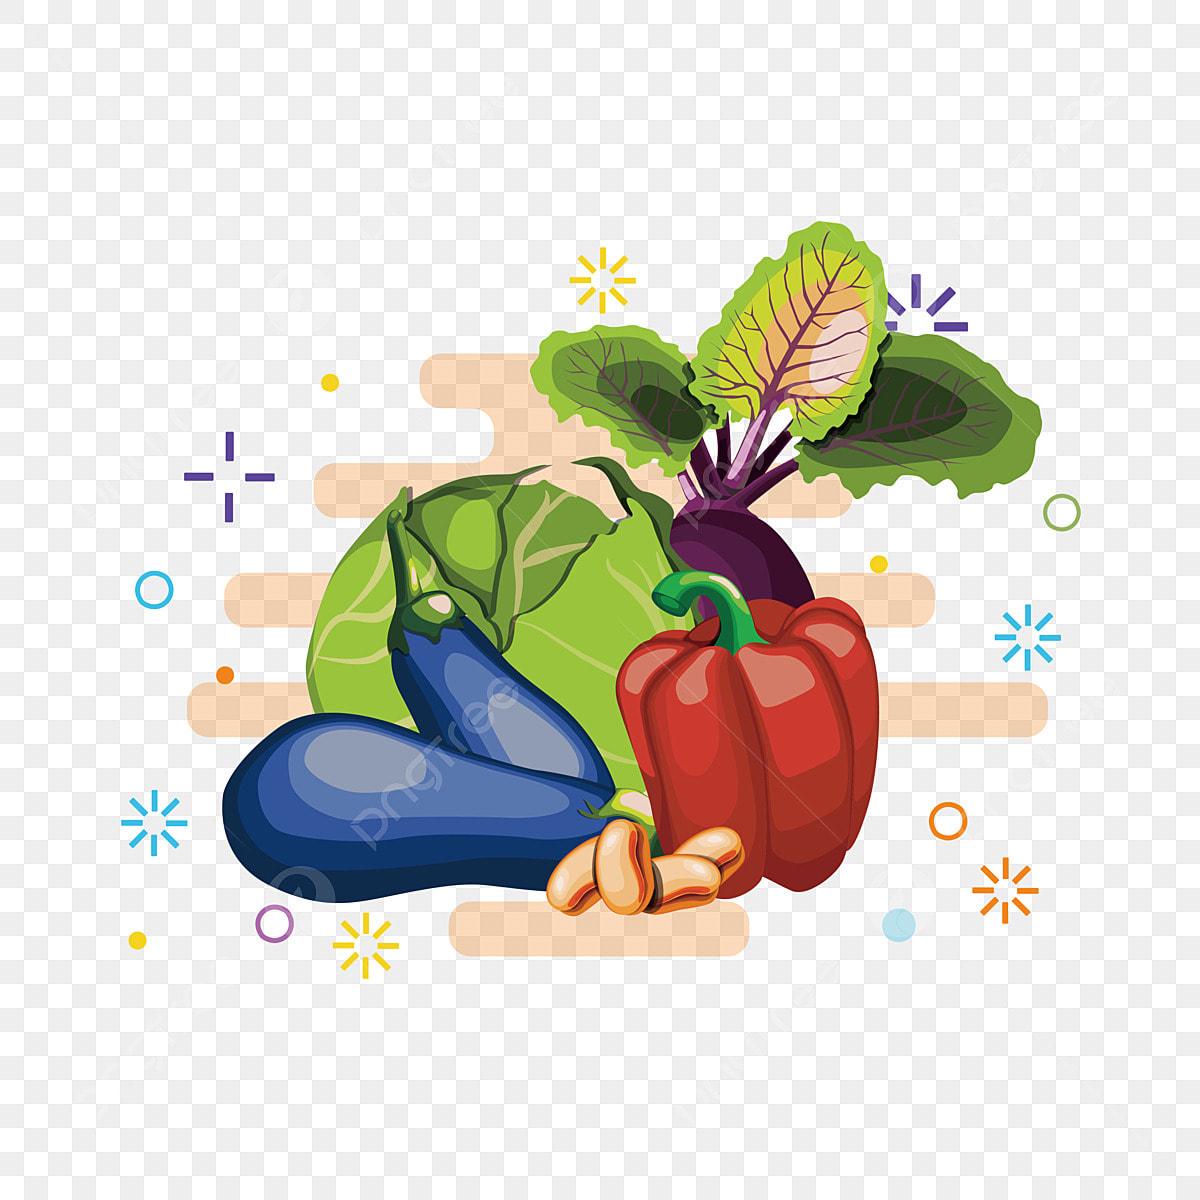 Sayur Sayuran Buah Keranjang Gambar Kreatif Troli Kale